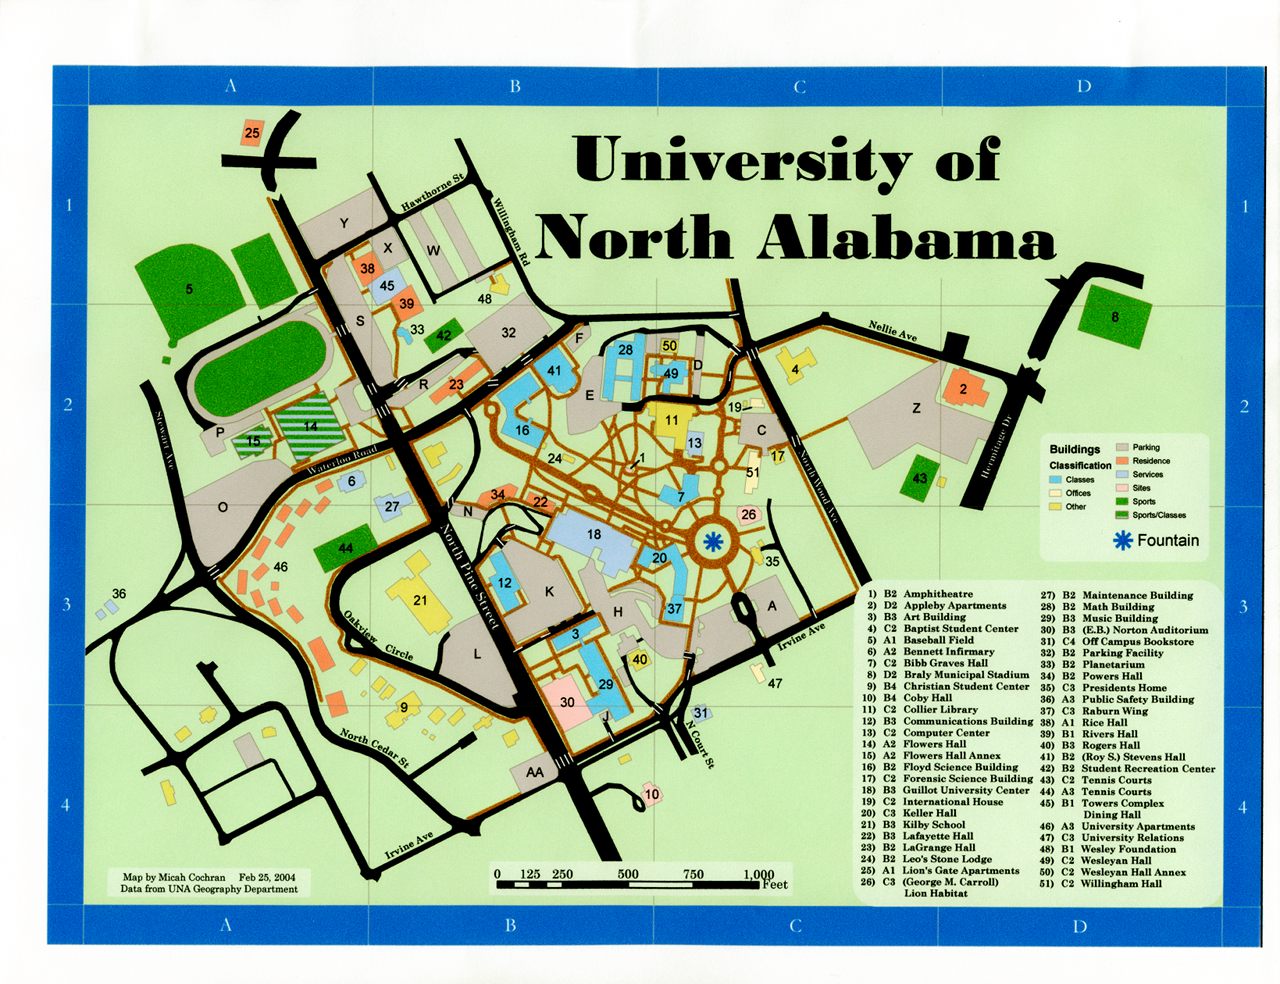 university of north alabama campus map U Of North Alabama Campus Map By Micahcochran On Deviantart university of north alabama campus map